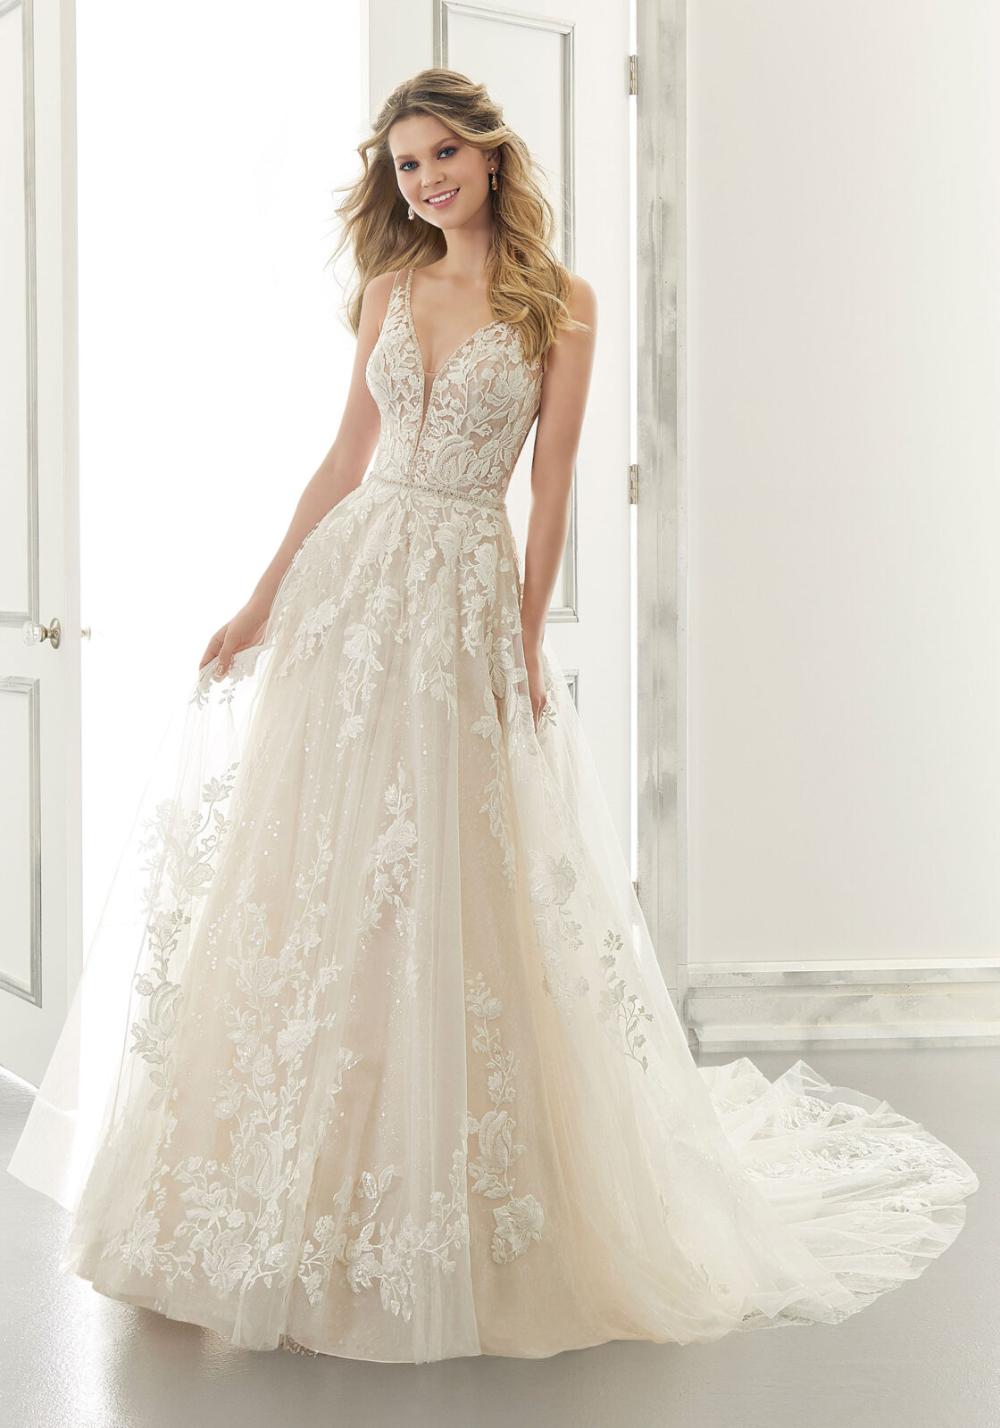 Ana Wedding Dress Morilee In 2020 Wedding Dress Prices A Line Wedding Dress Wedding Dresses